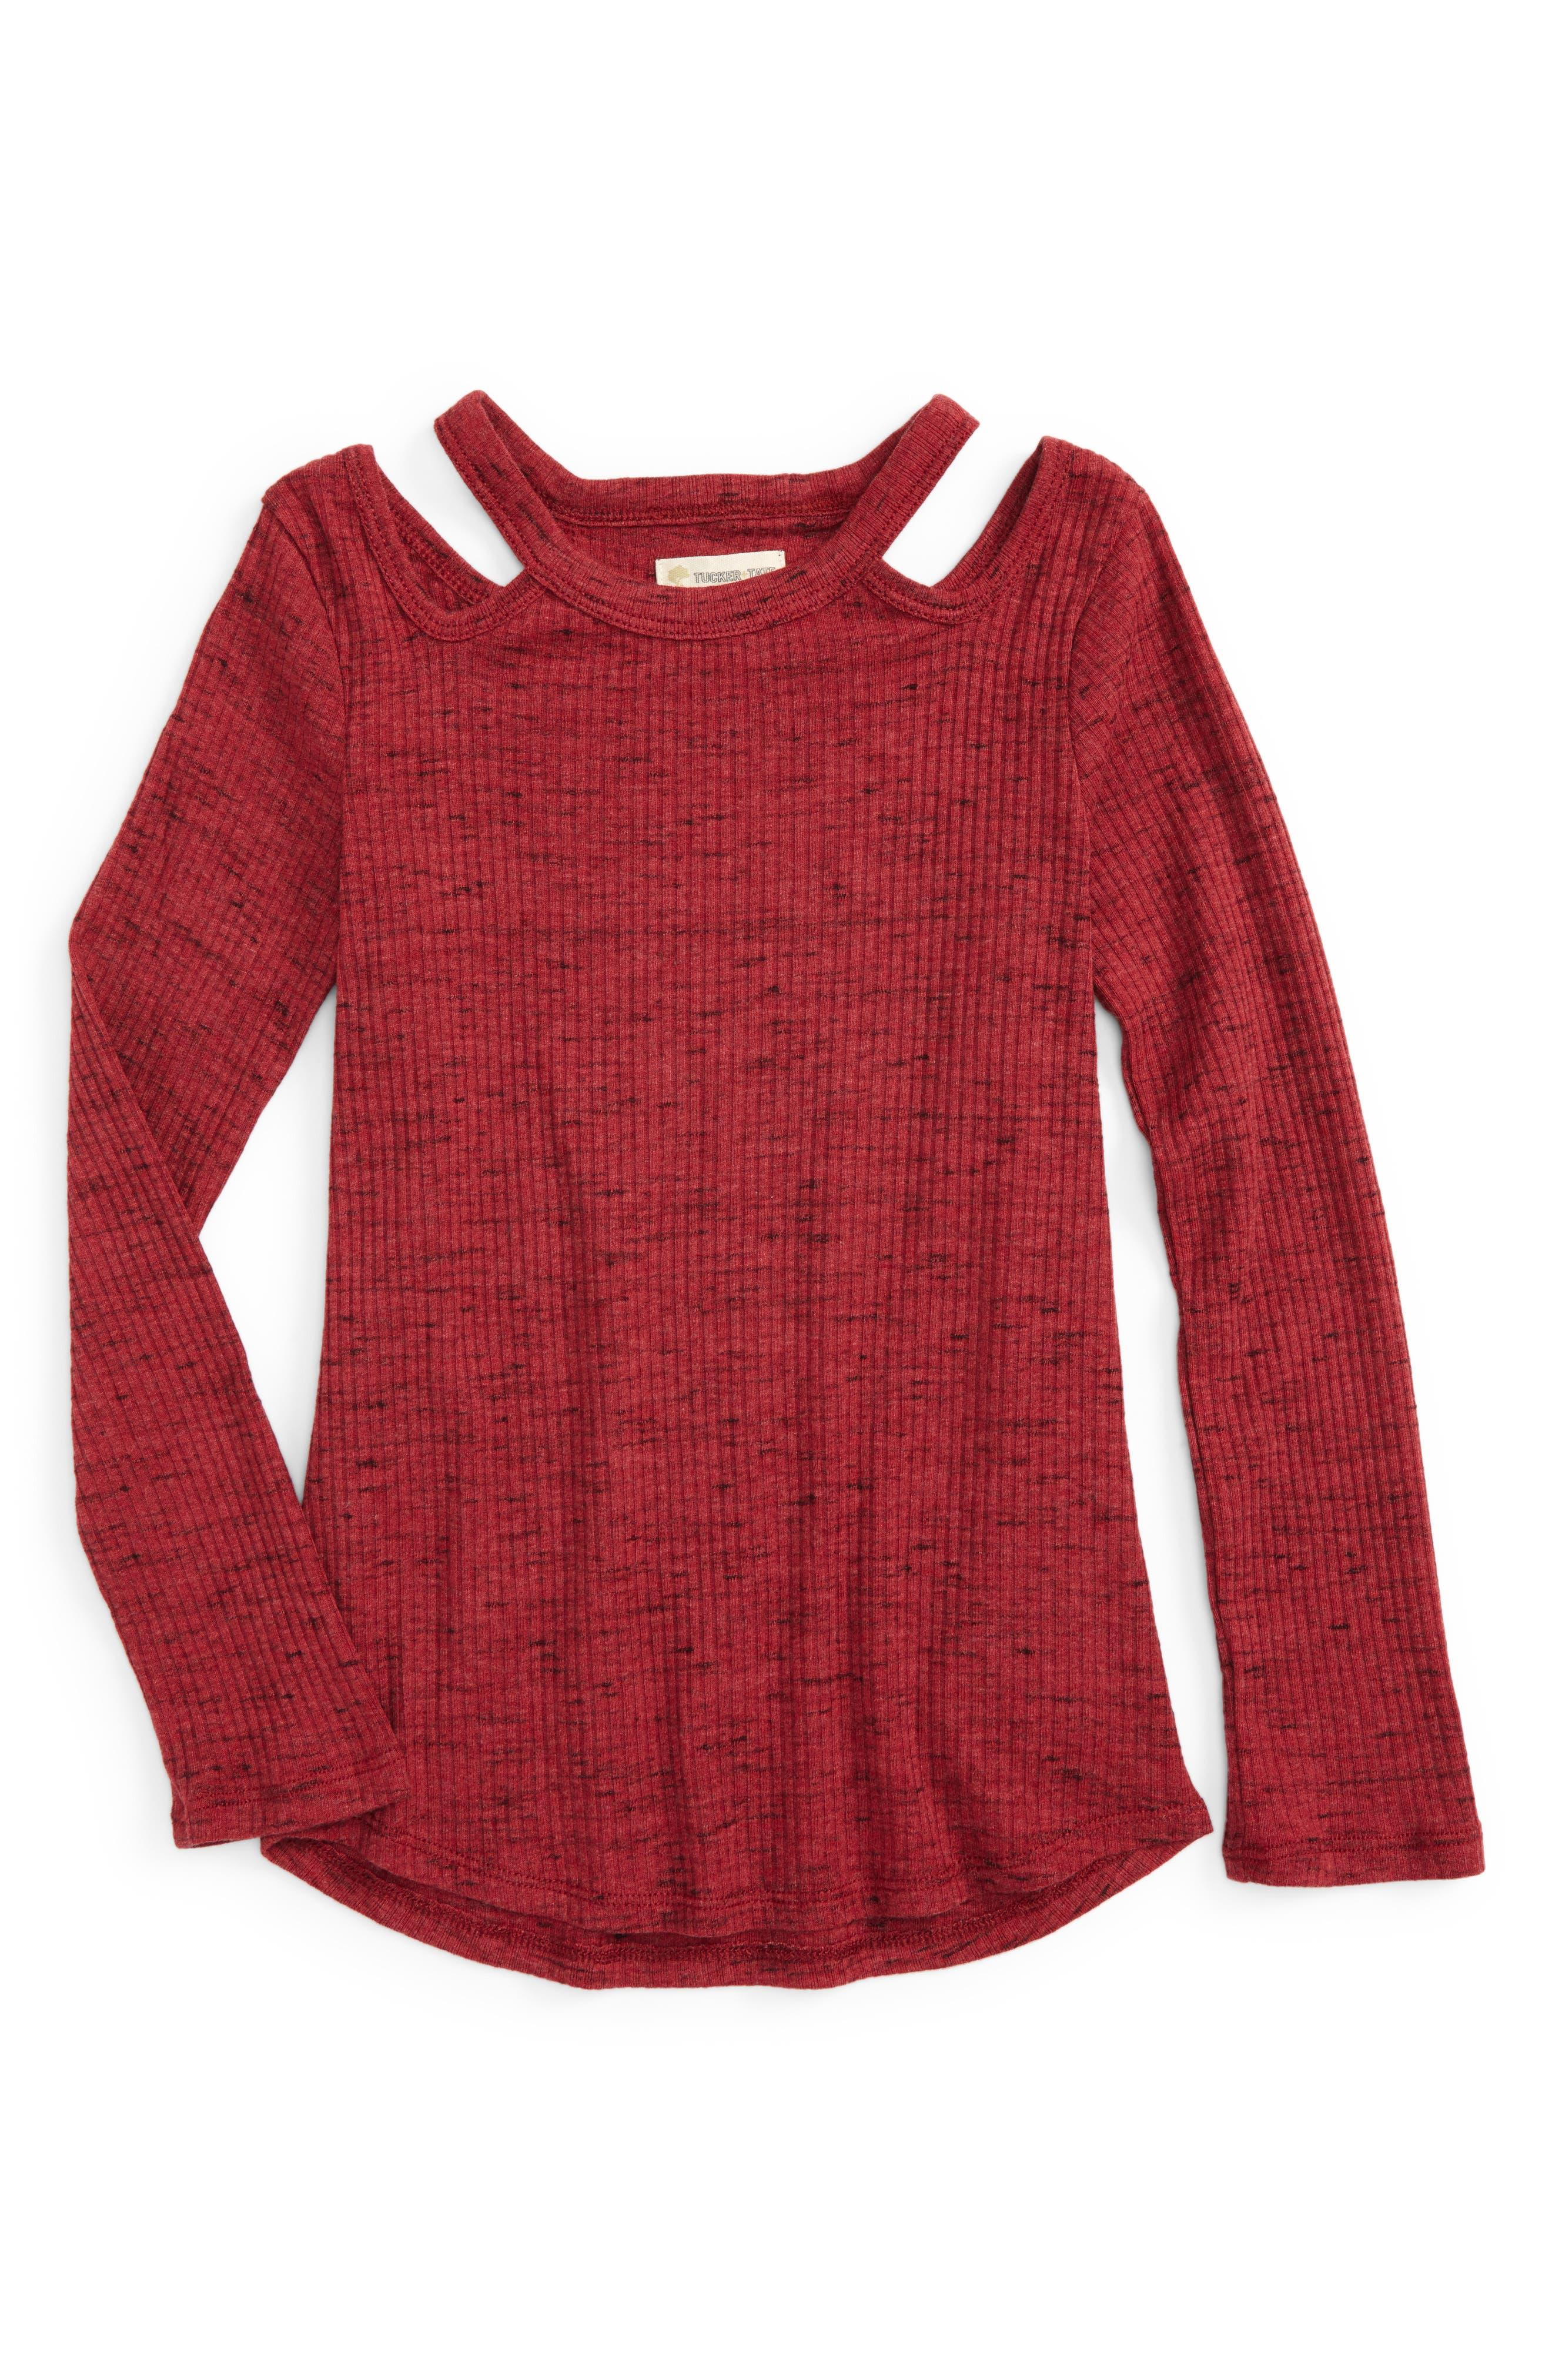 Cutout Rib Knit Tee,                         Main,                         color, Red Tibetan Spacedye